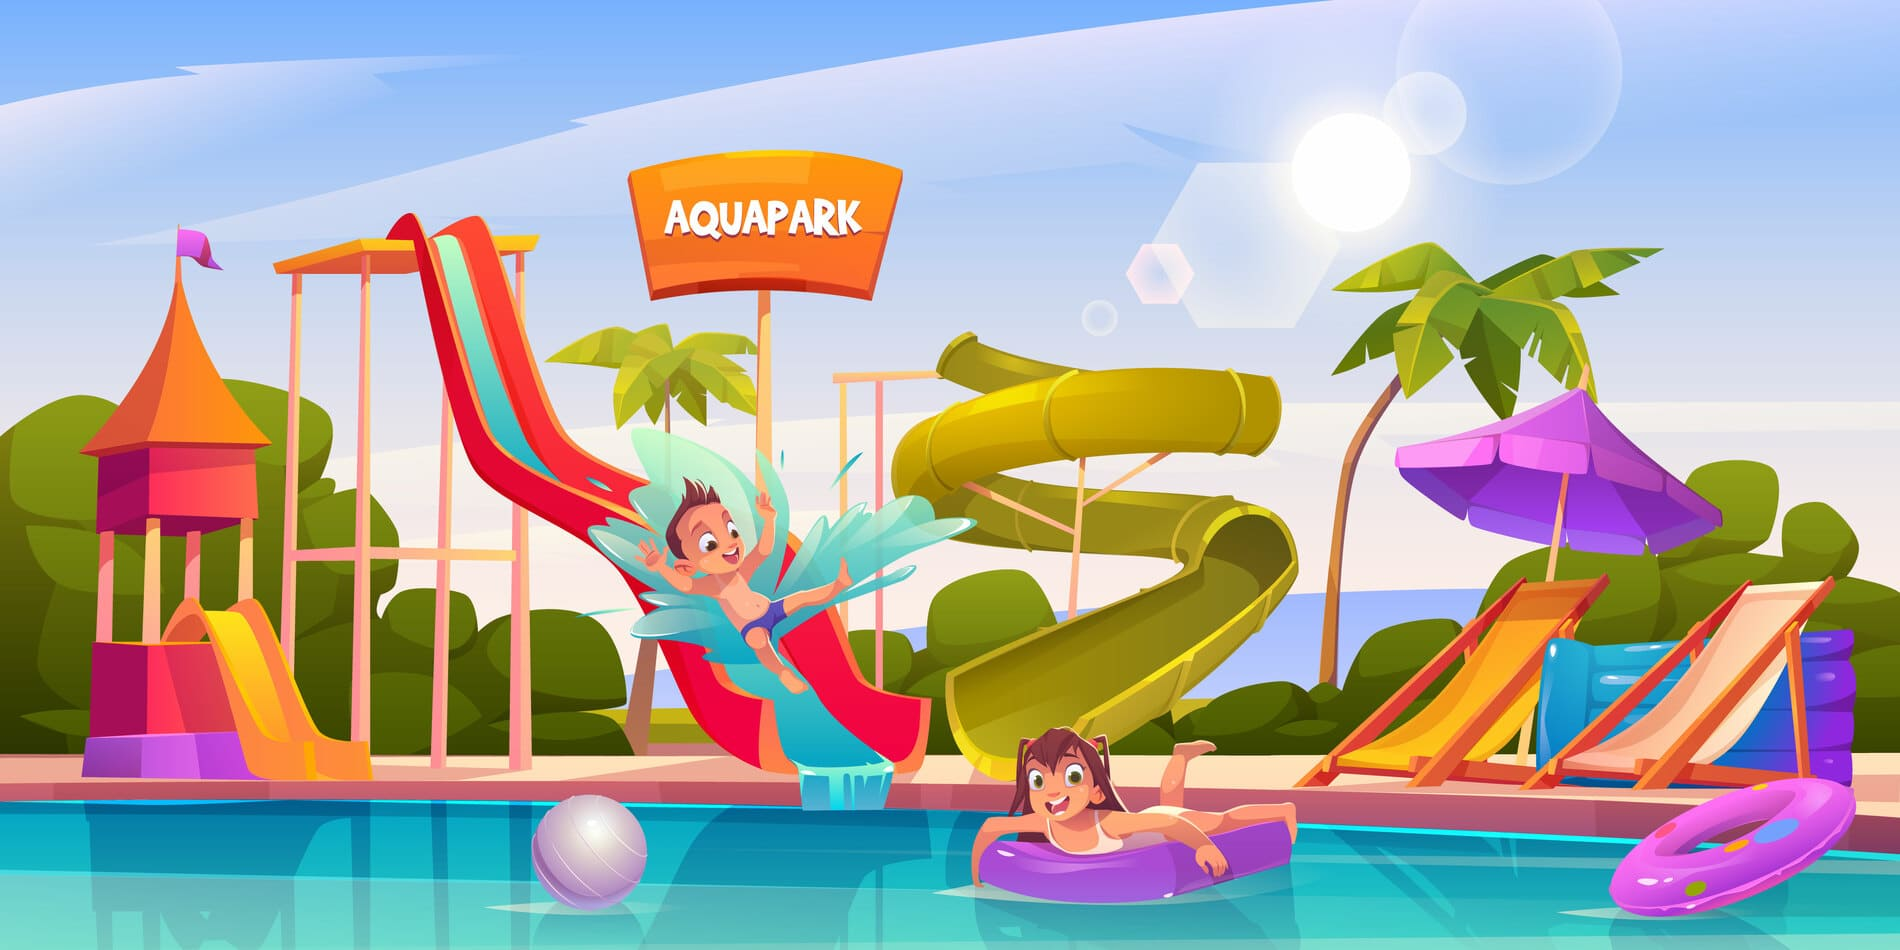 Aqua venture Waterpark